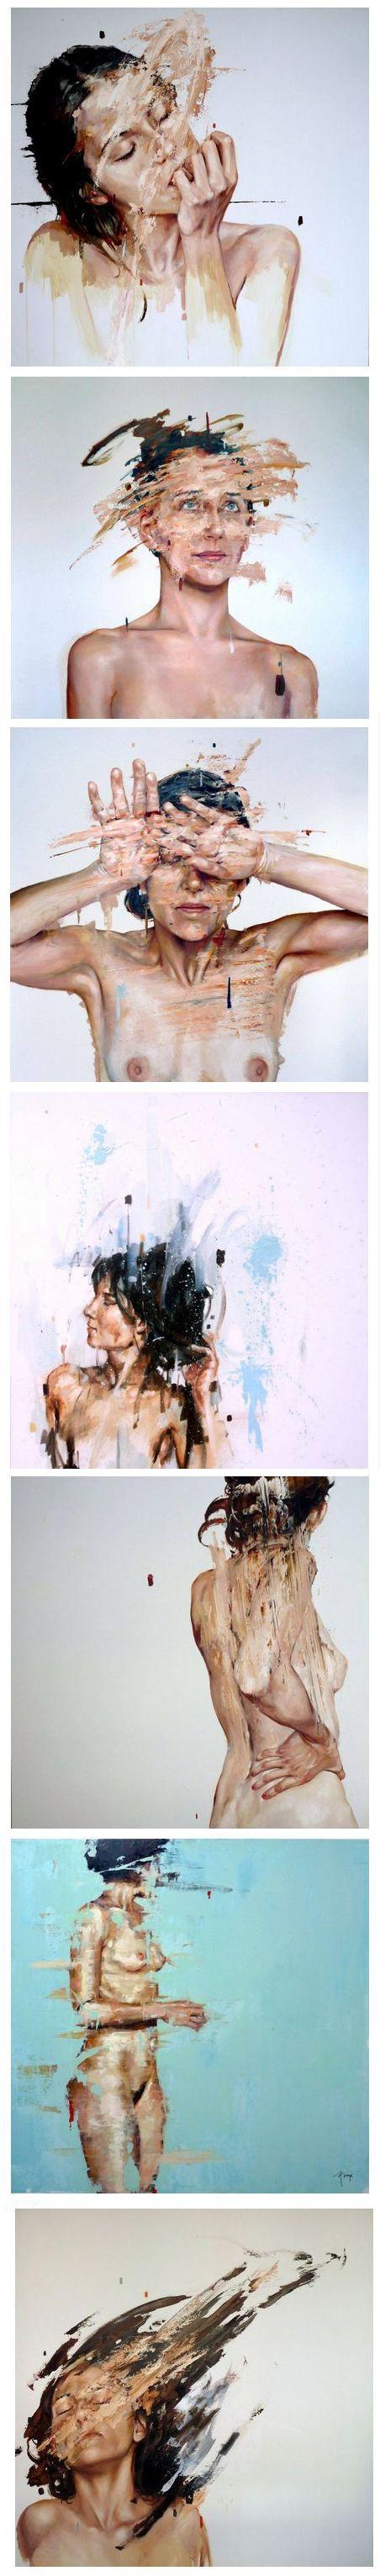 Destroyed Paintings by Cesar Biojo